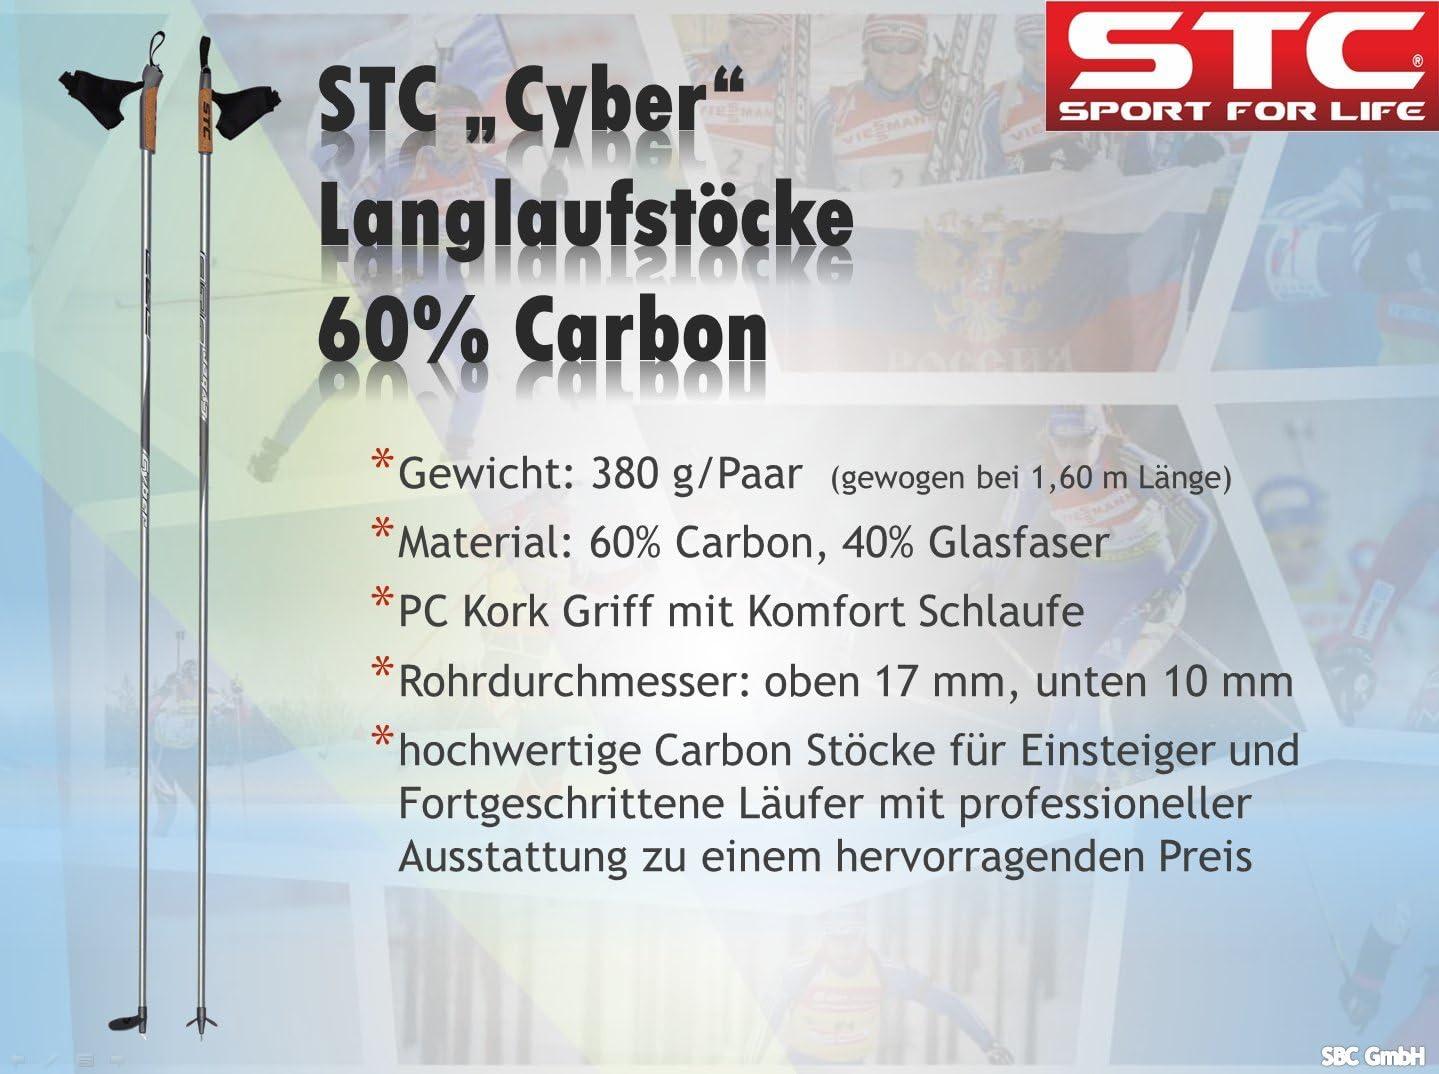 STC 60/% Carbon Langlaufstock Skating St/öcke Skist/öcke Skate Cyber